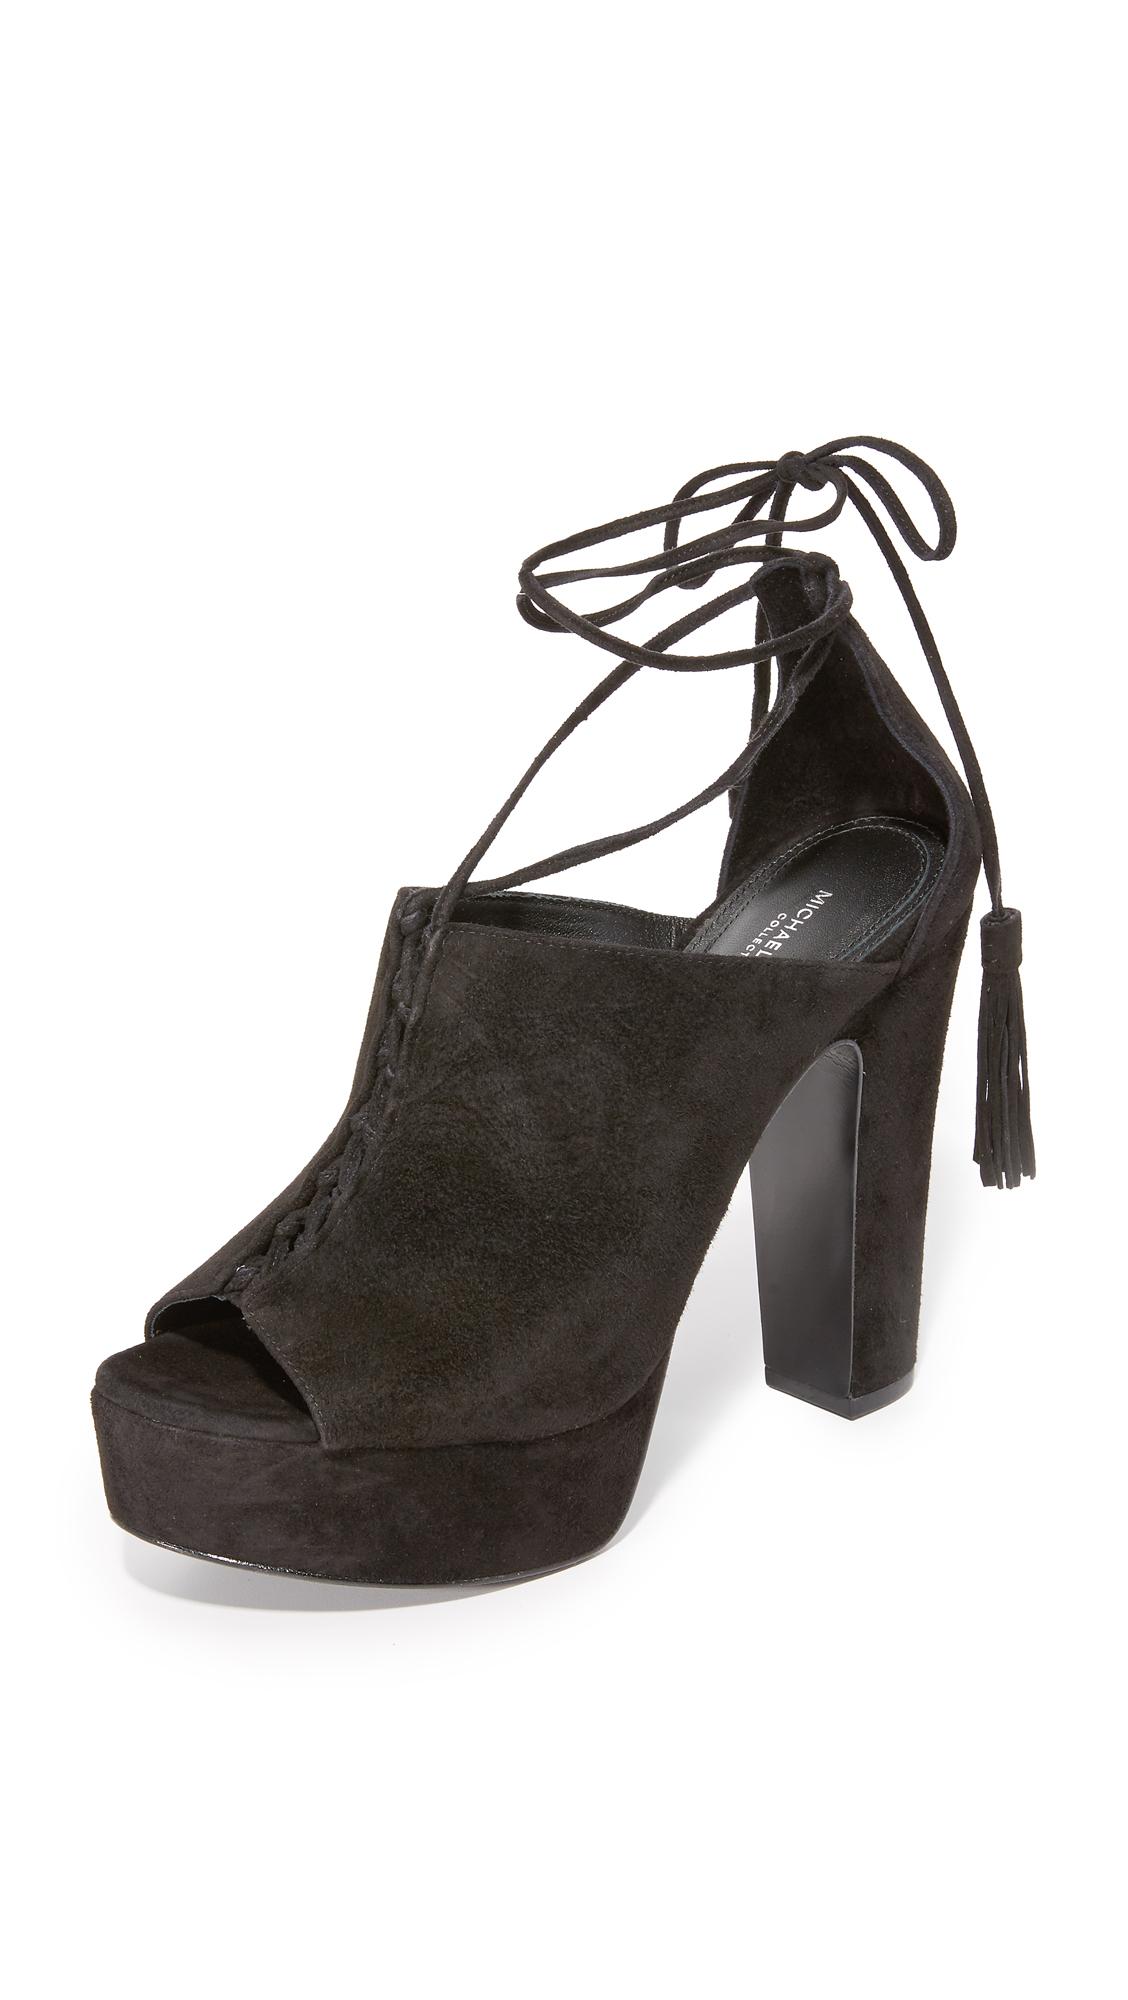 michael kors female 188971 michael kors collection sylvan sandals black